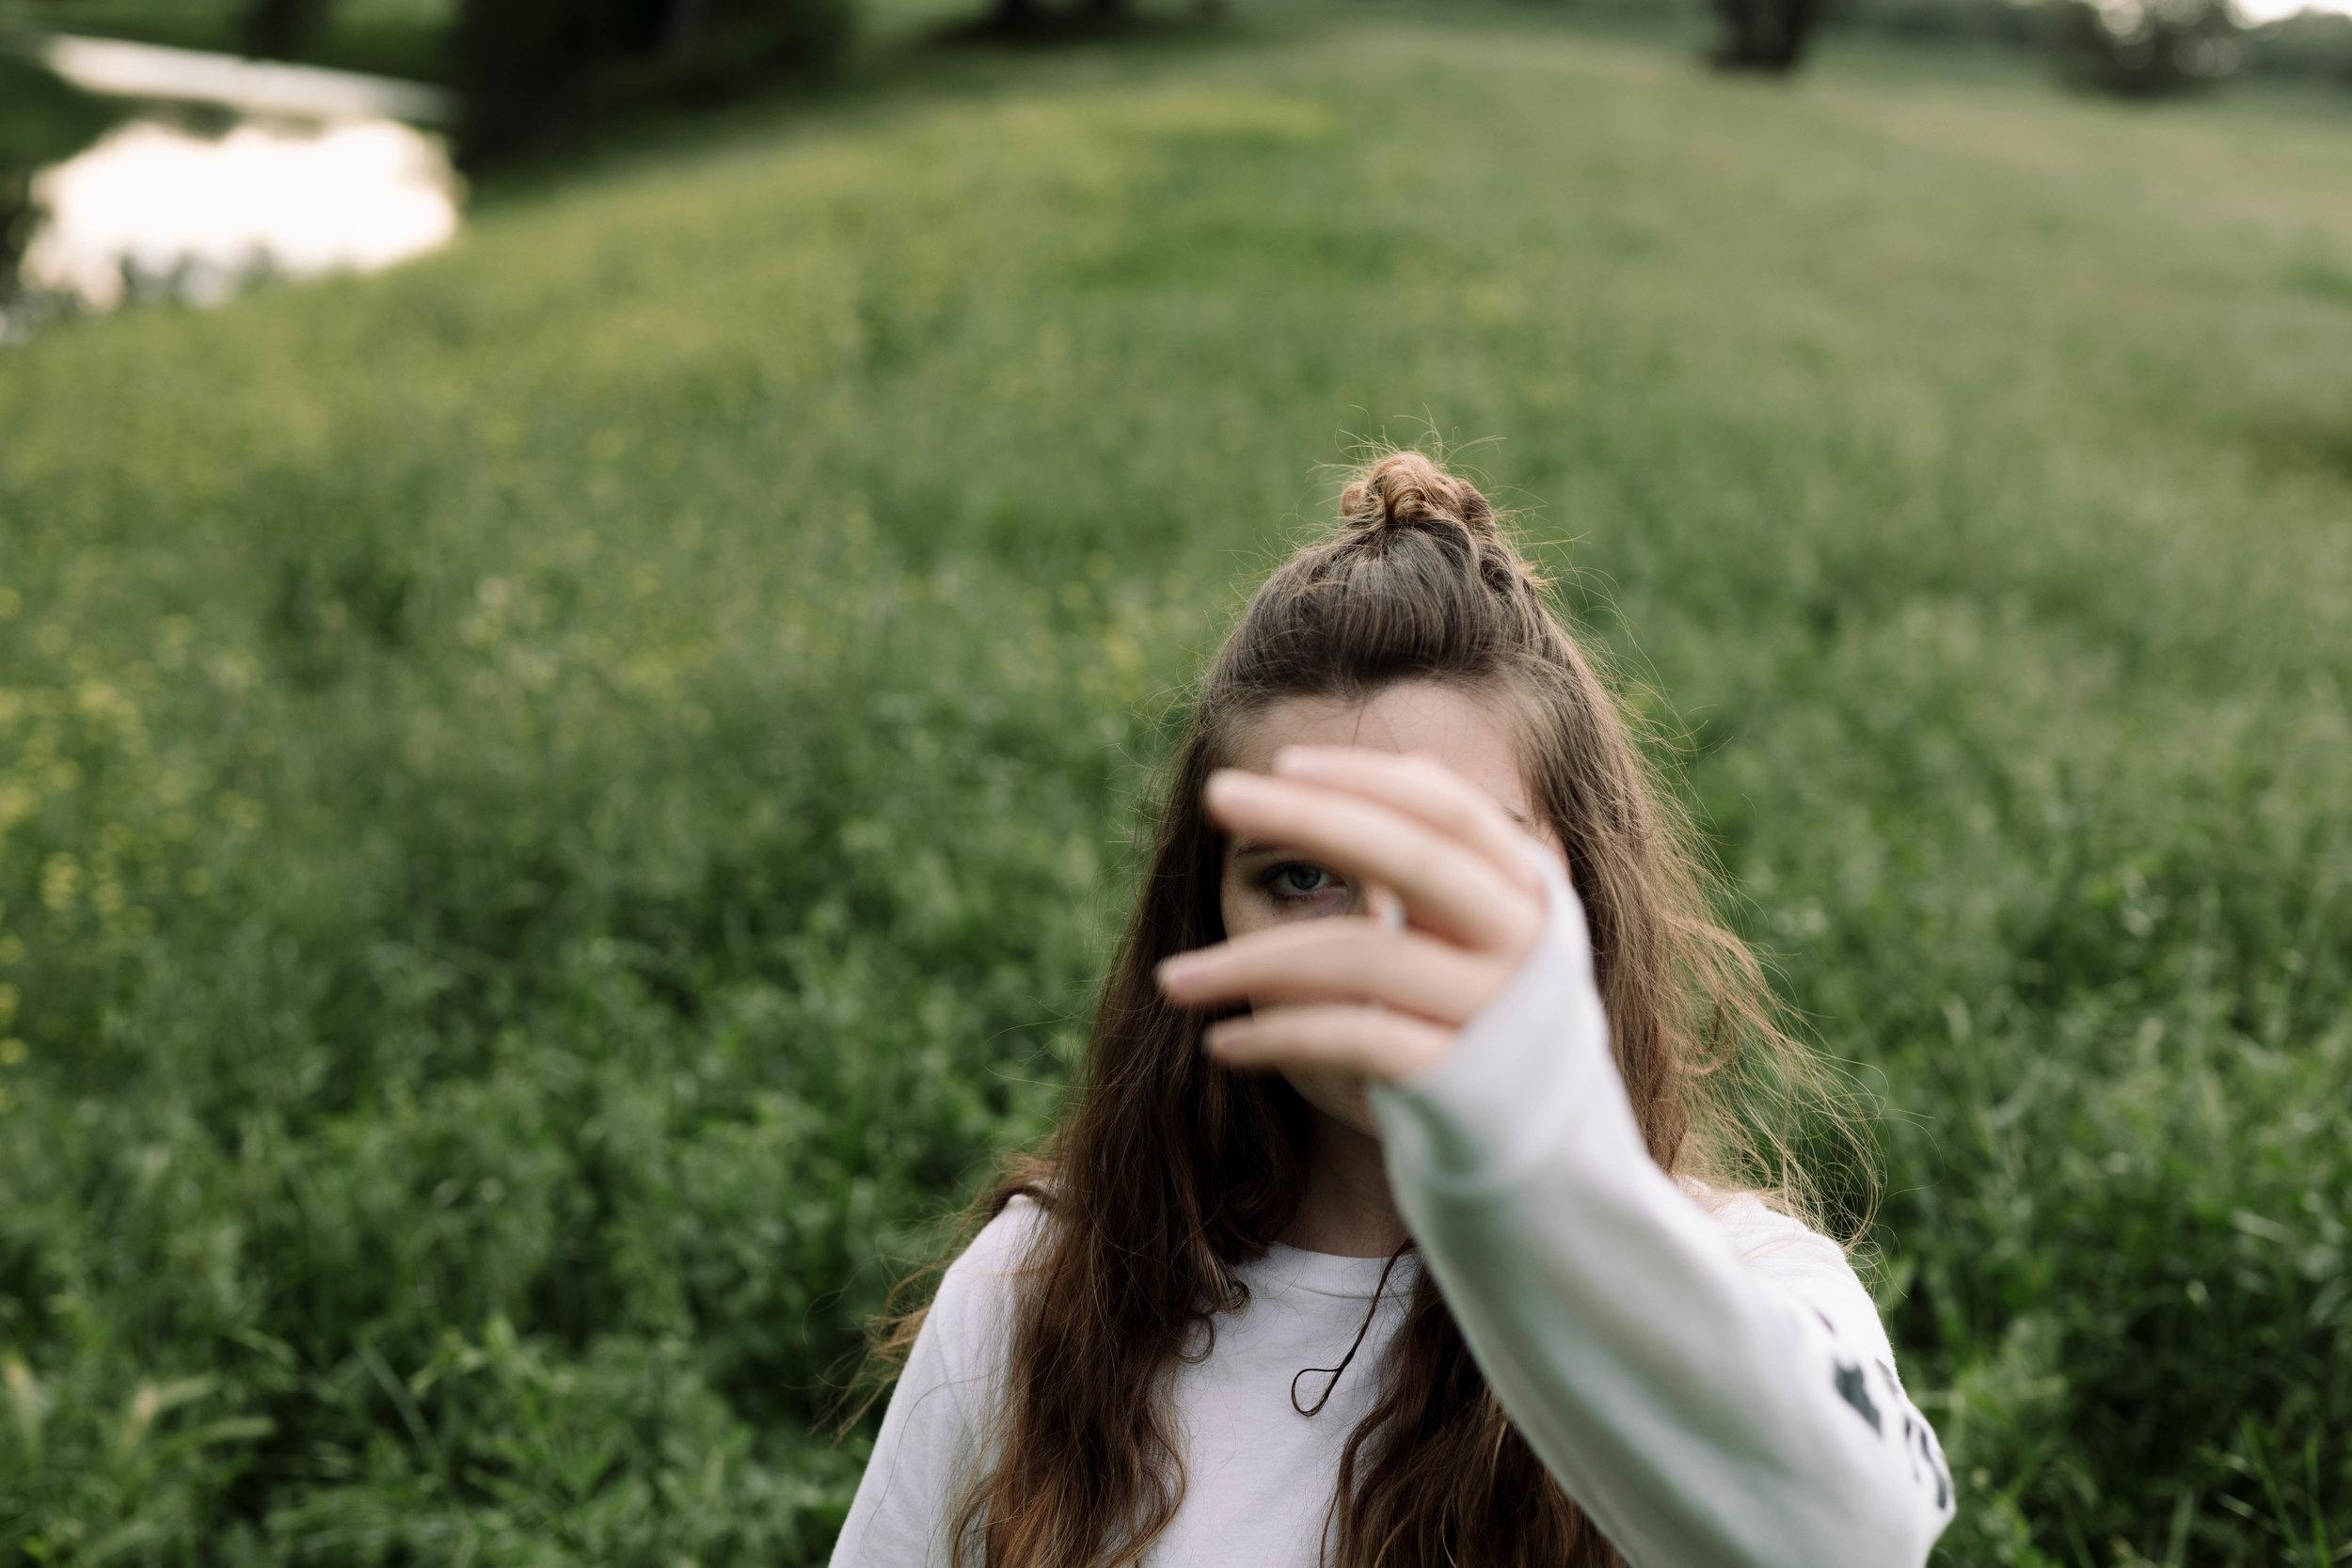 selfportraitchallenge-Daylight 14-8.jpg